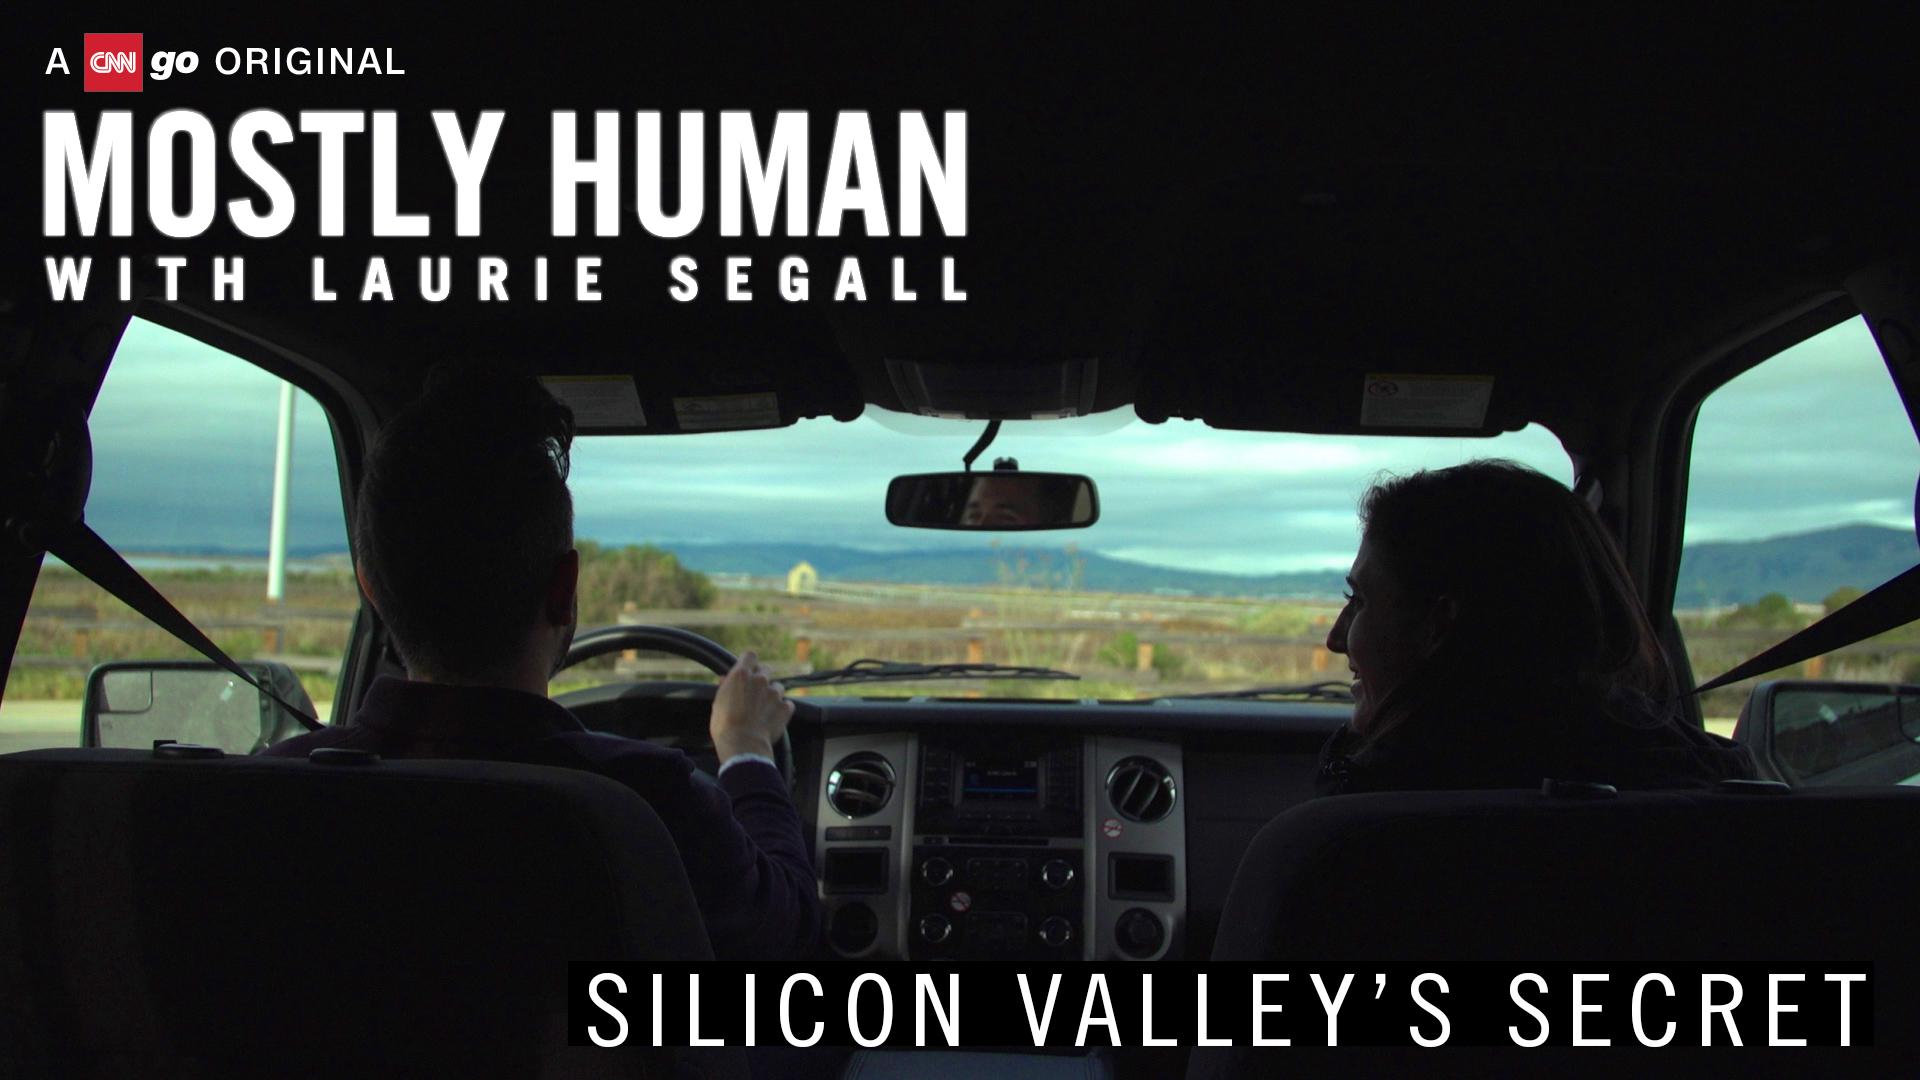 money.cnn.com - Silicon Valley's Secret